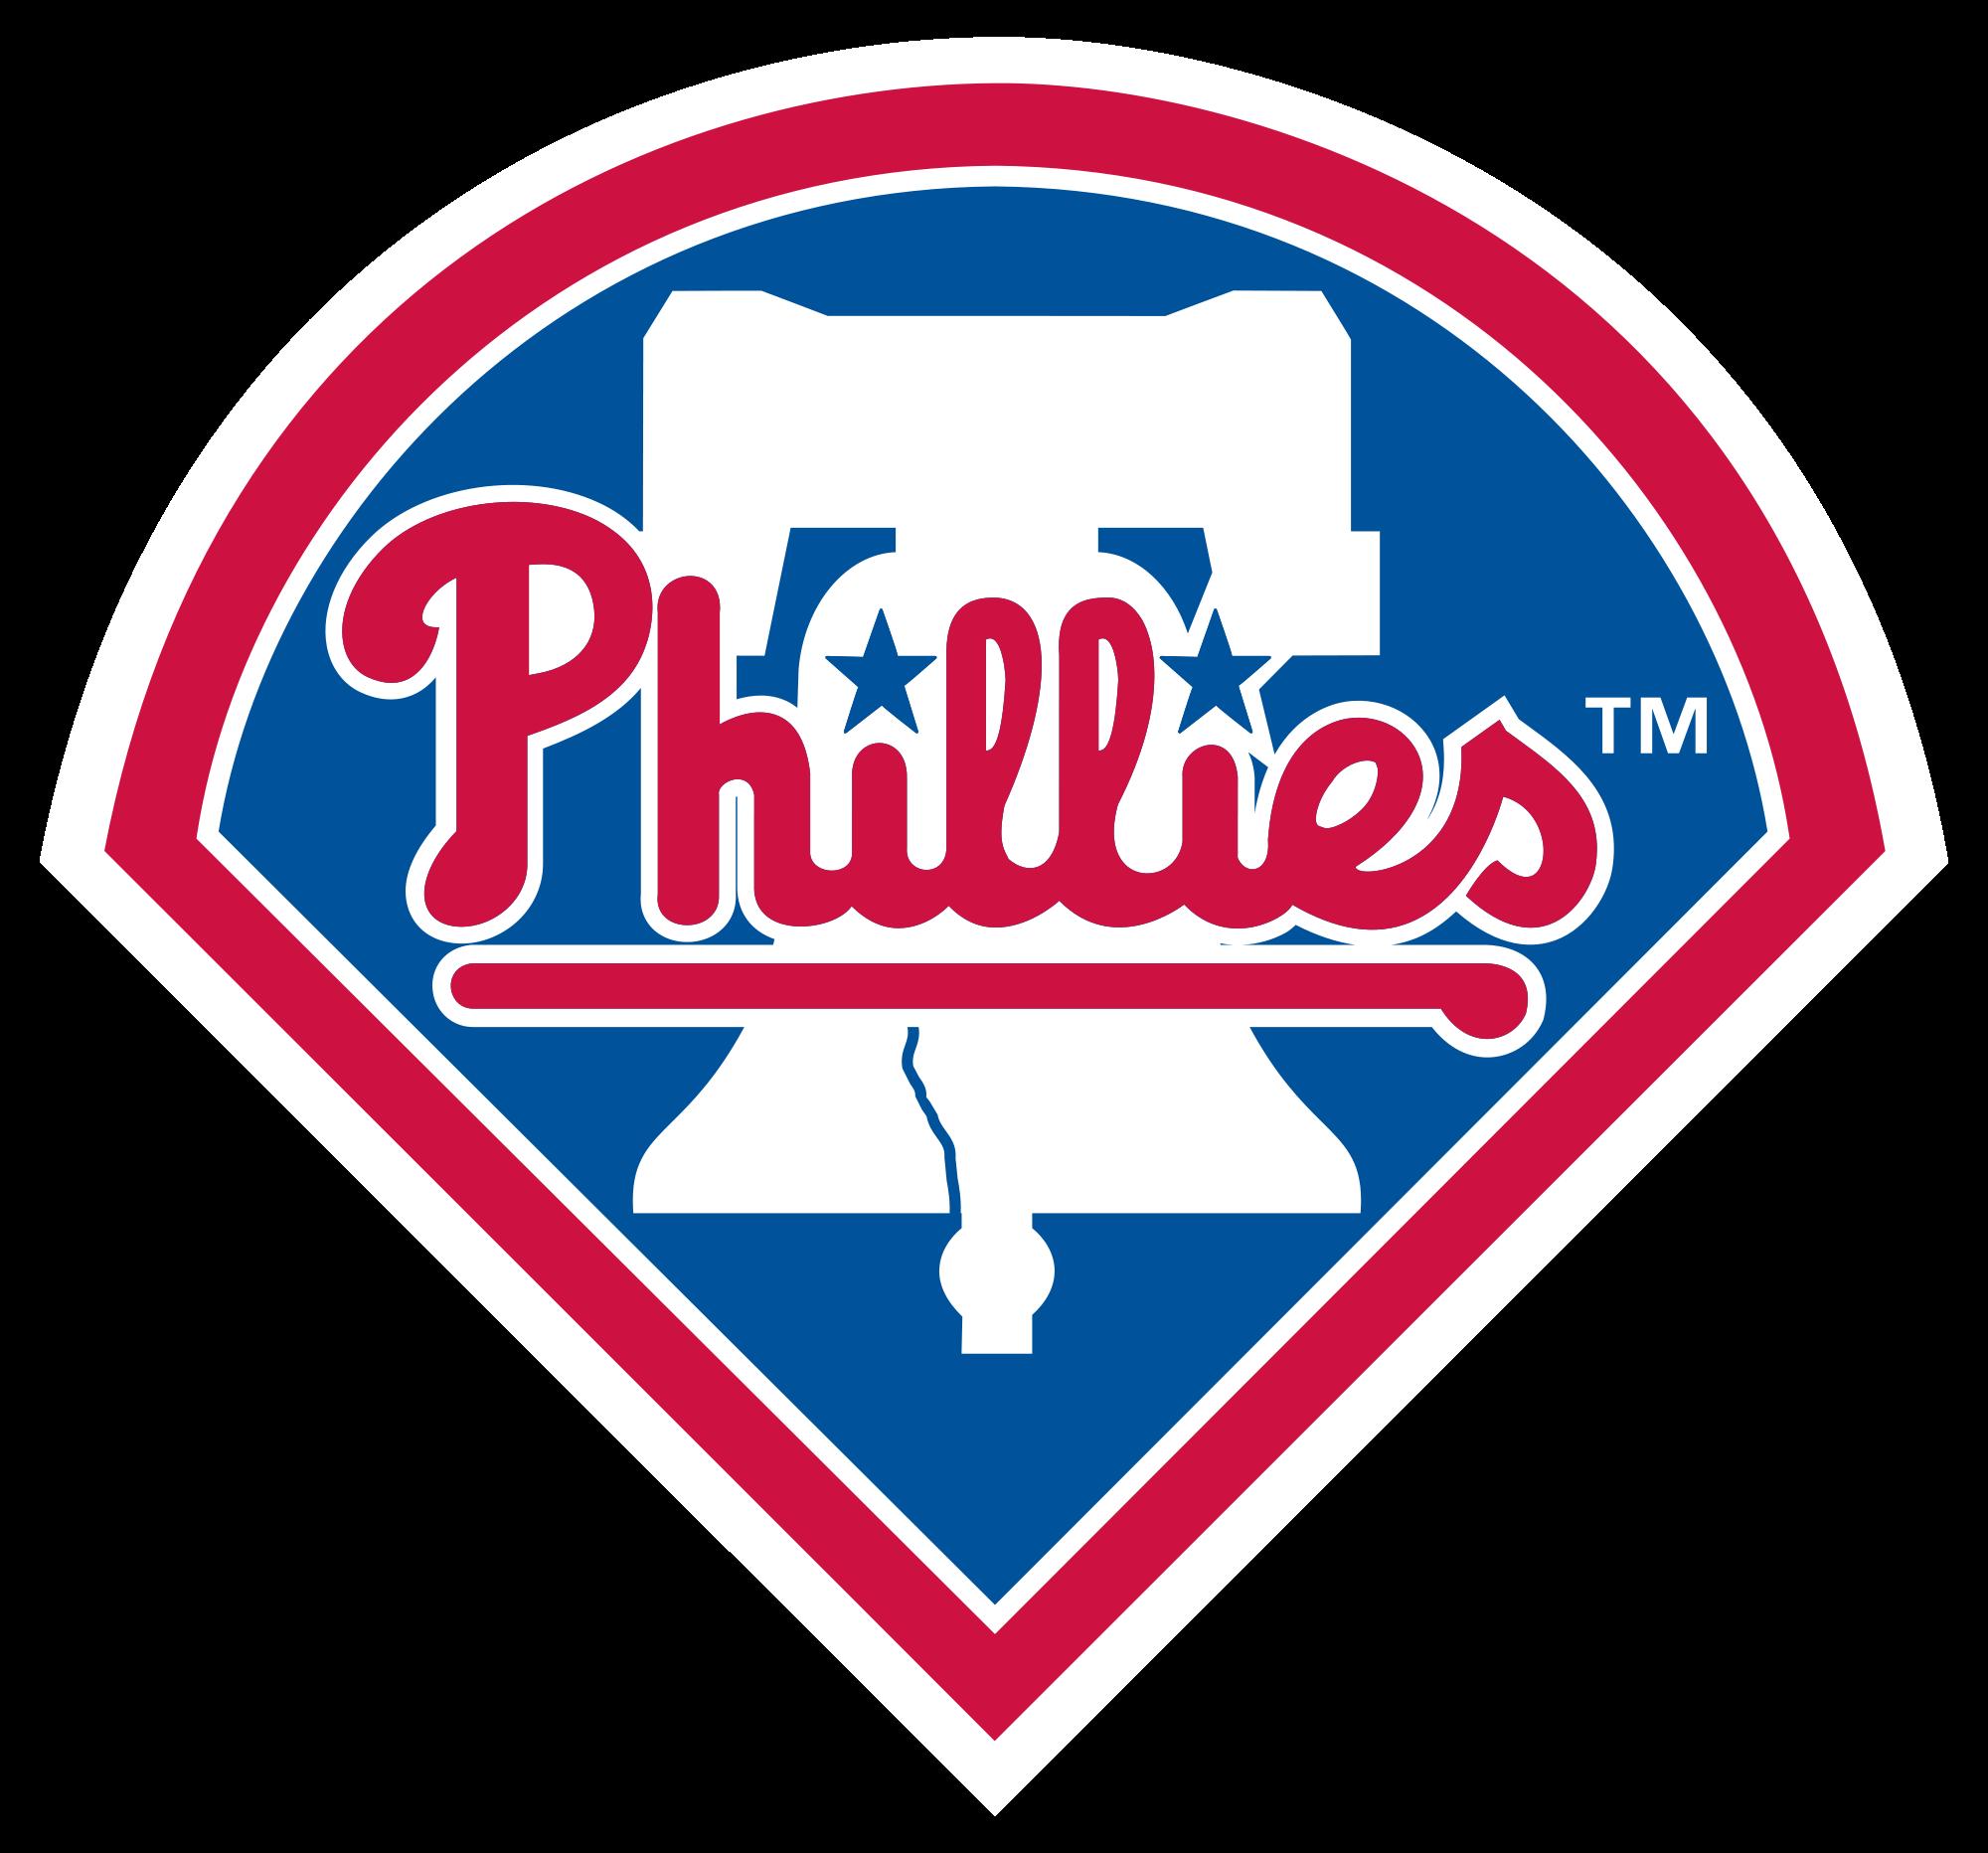 Phils Clinch Worst Record In Mlb Lock Down Top Draft Pick Philadelphia Phillies Baseball Philadelphia Phillies Logo Phillies Baseball